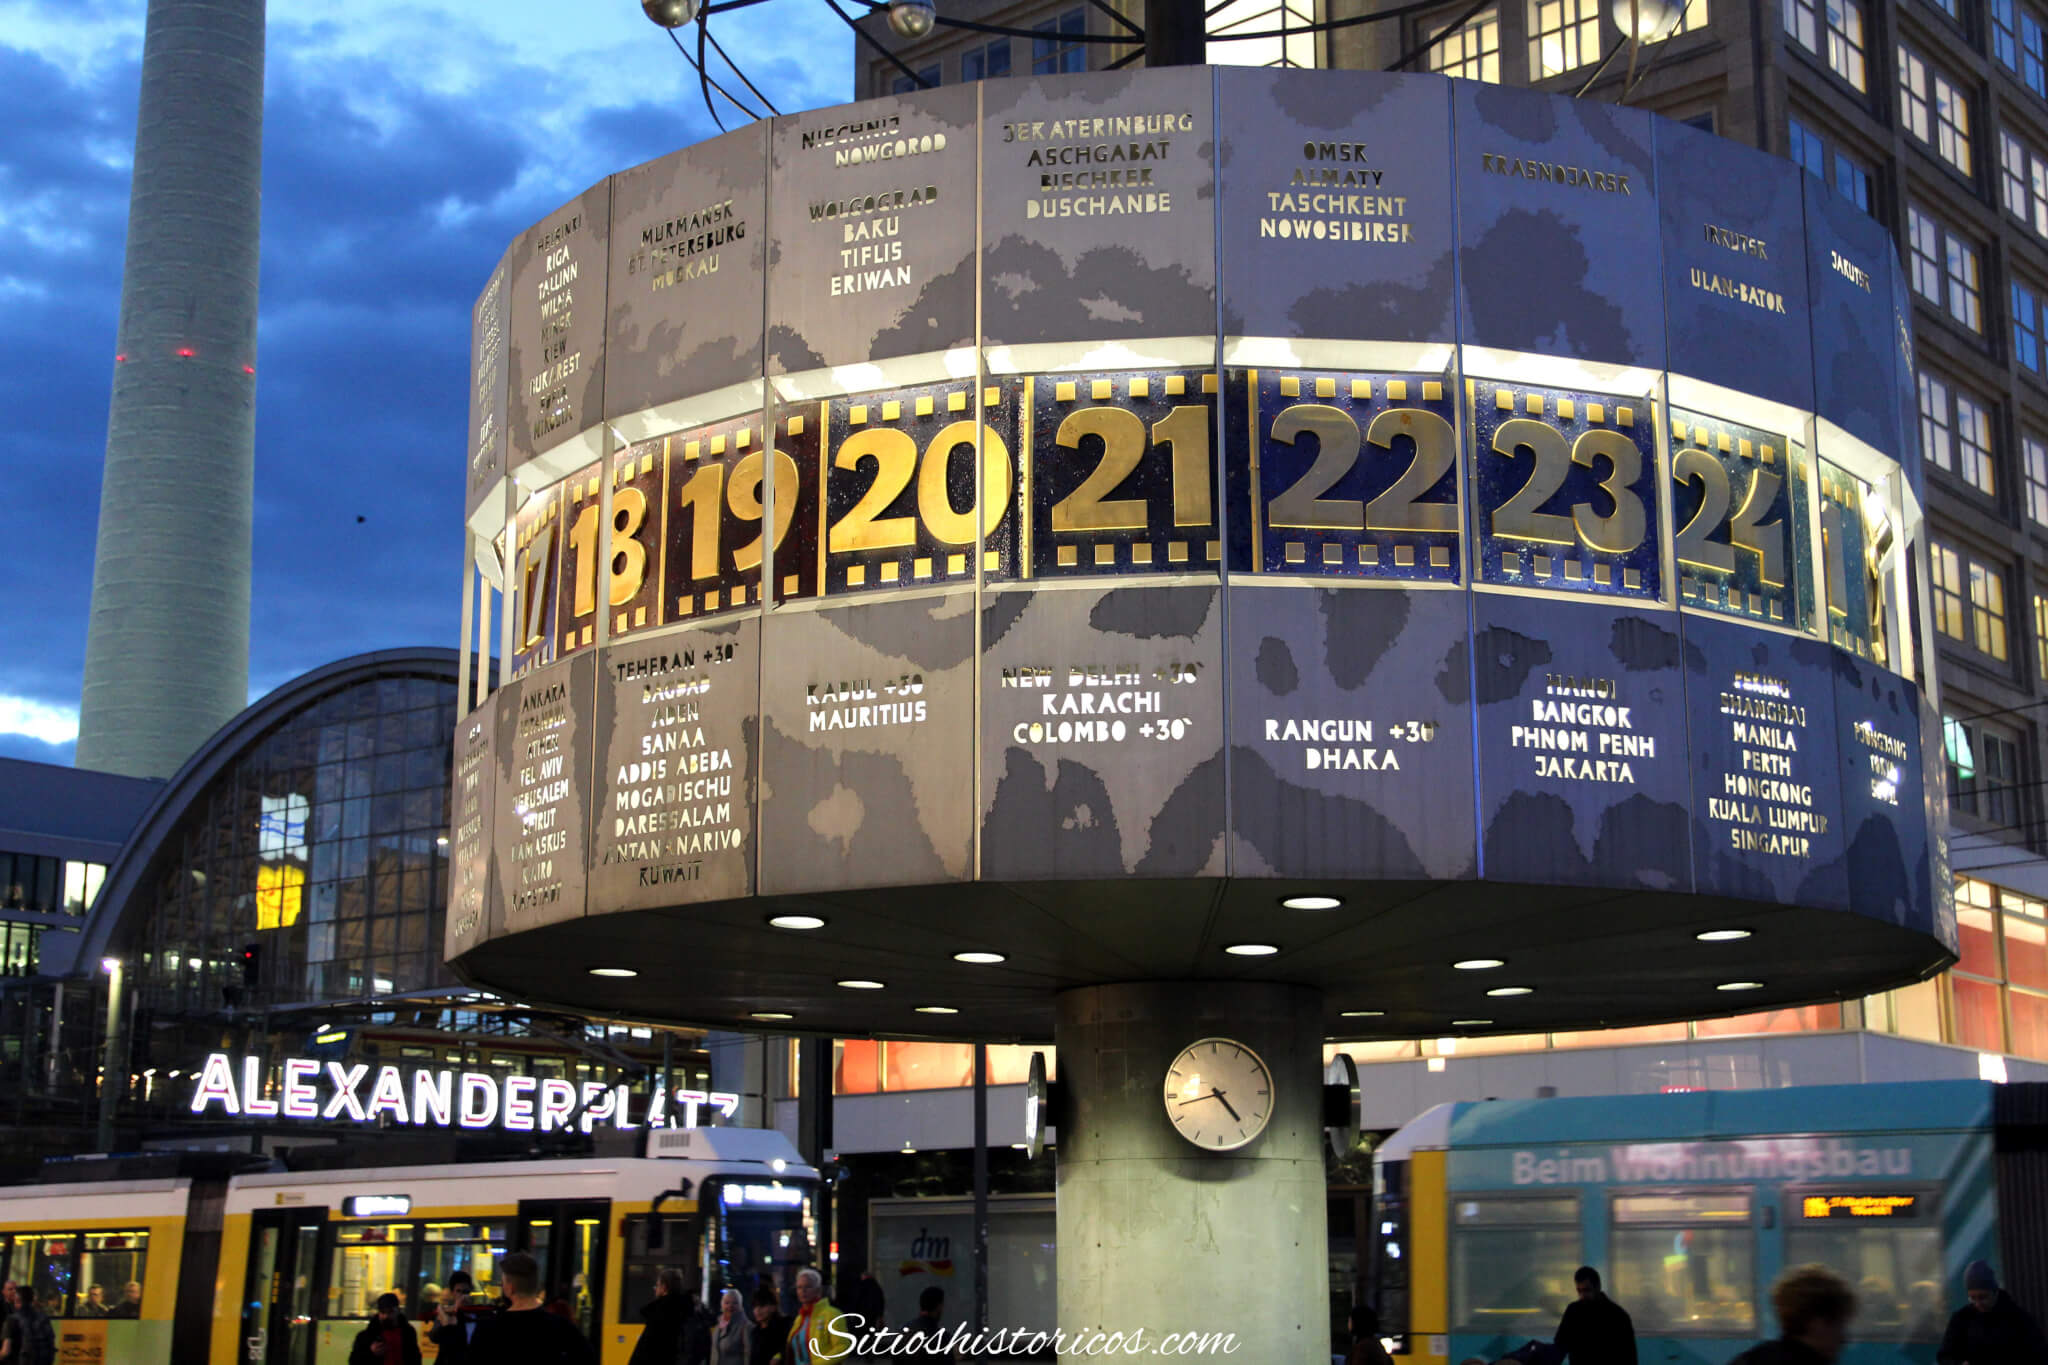 Reloj mundial Alexanderplatz